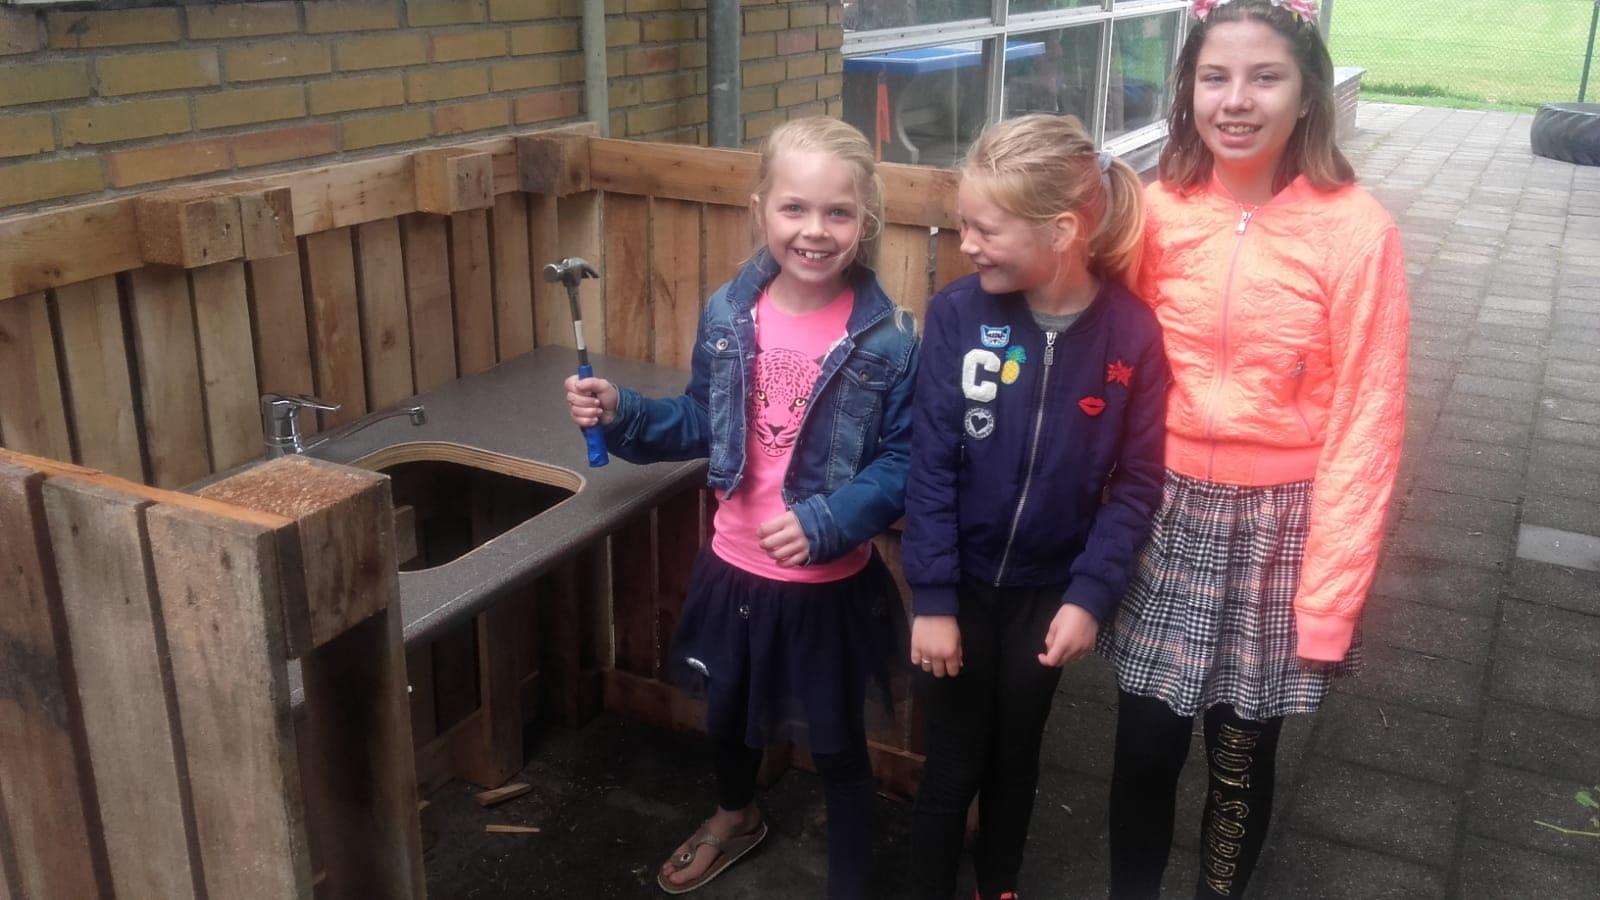 BSO de Vlieger - Dokkum Kids First kinderopvang